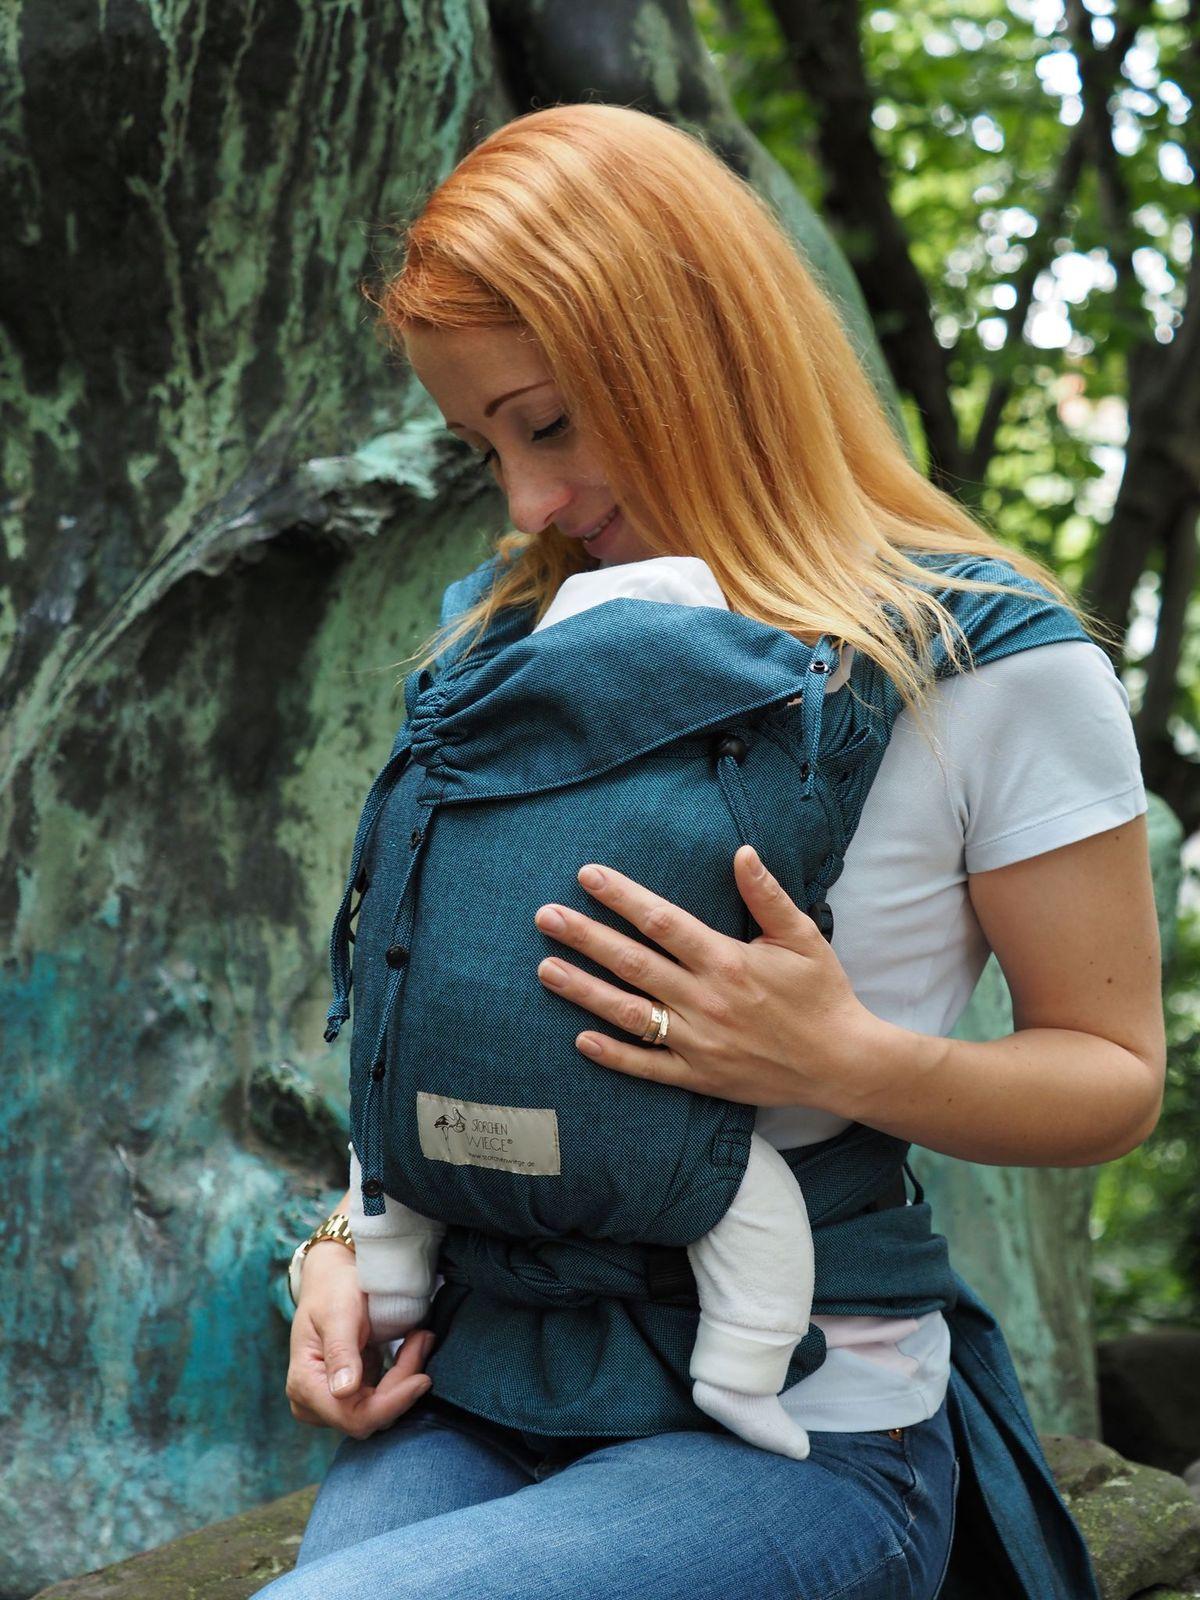 Babycarrier STORCHENWIEGE NOUVEAU - Wrap Babycarrier Storchenwiege Turquoise